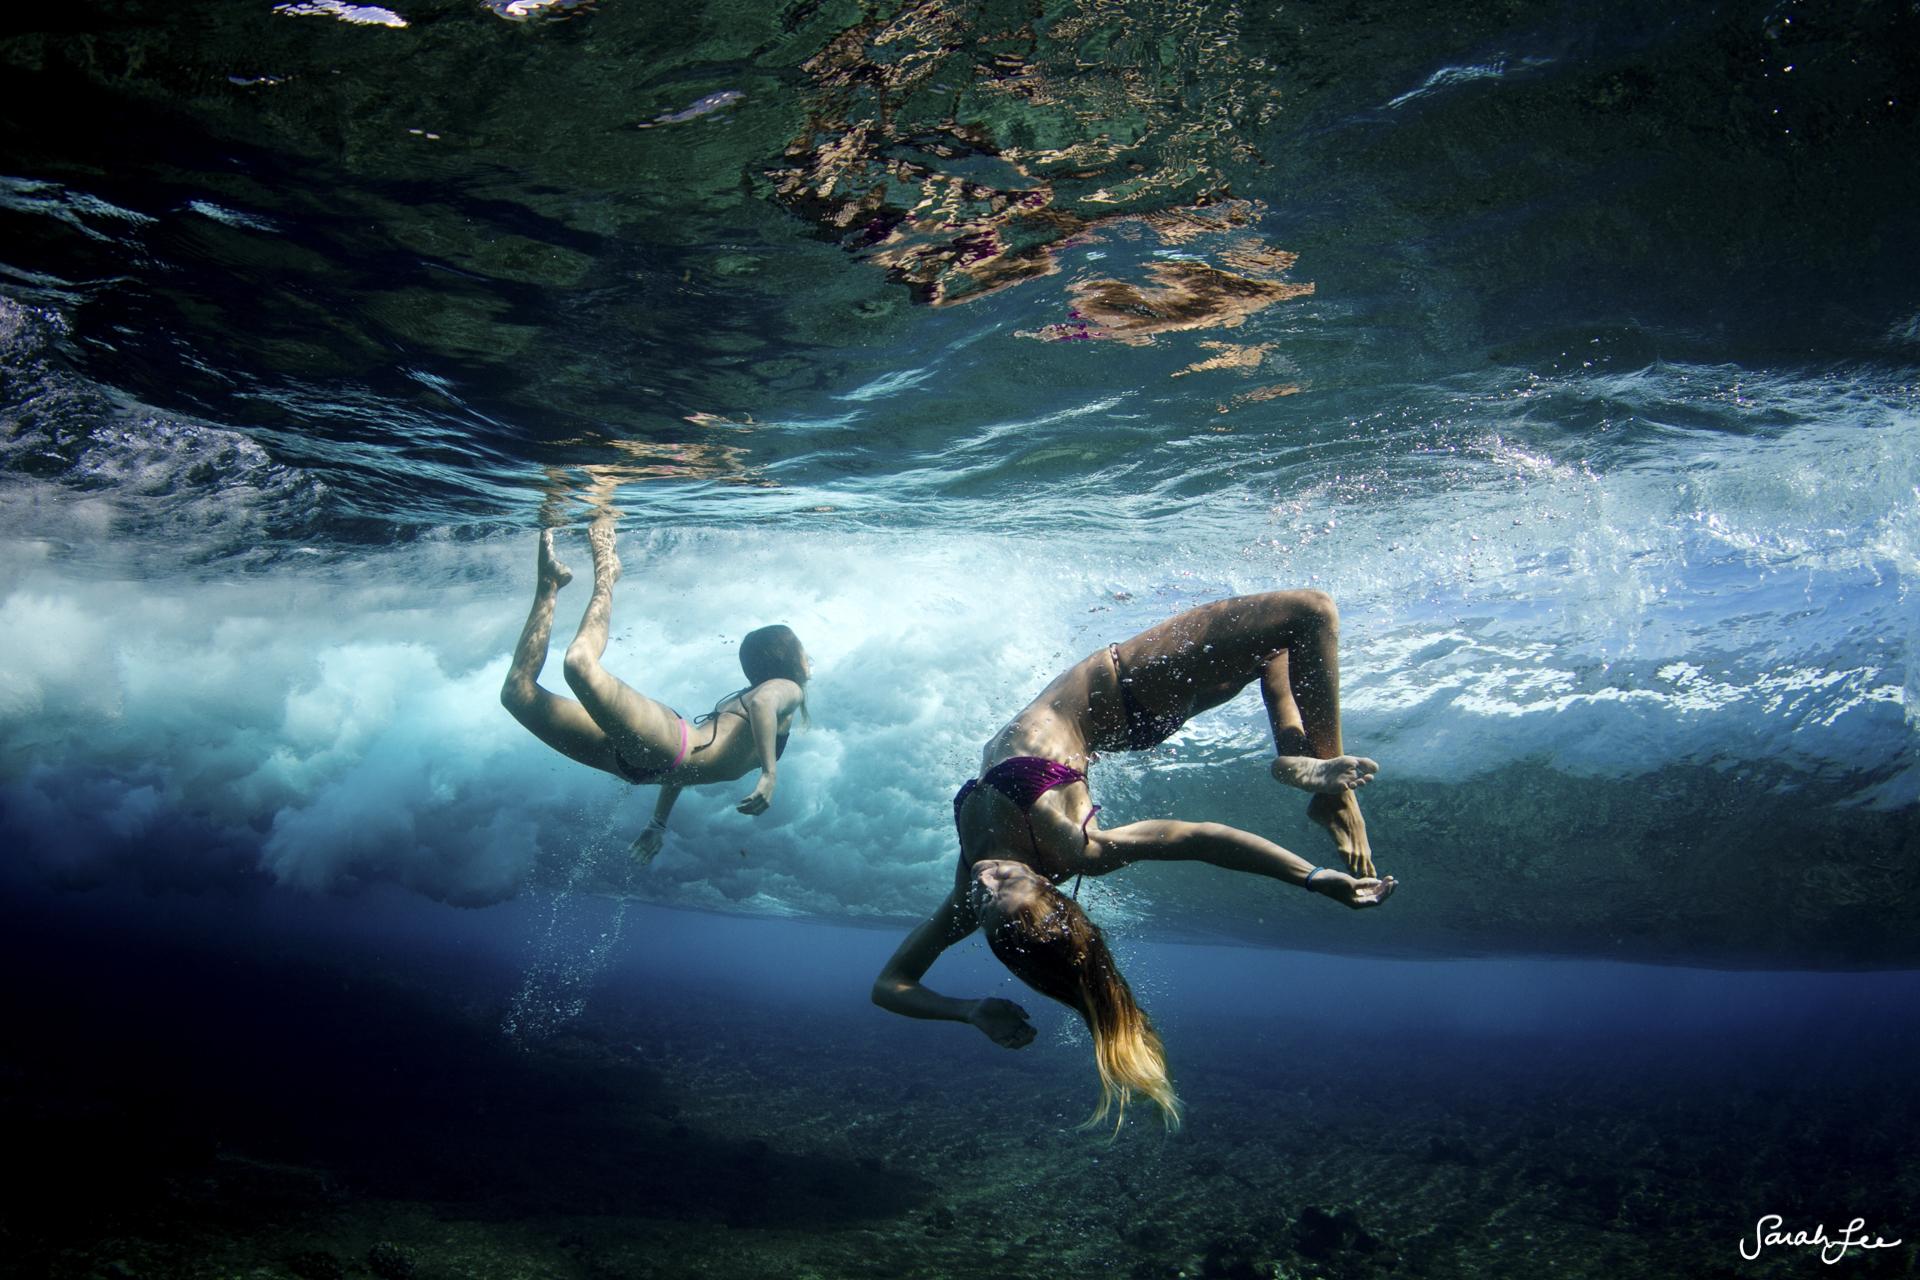 006_Sarah_Lee_Photography_Underwater_3156.jpg